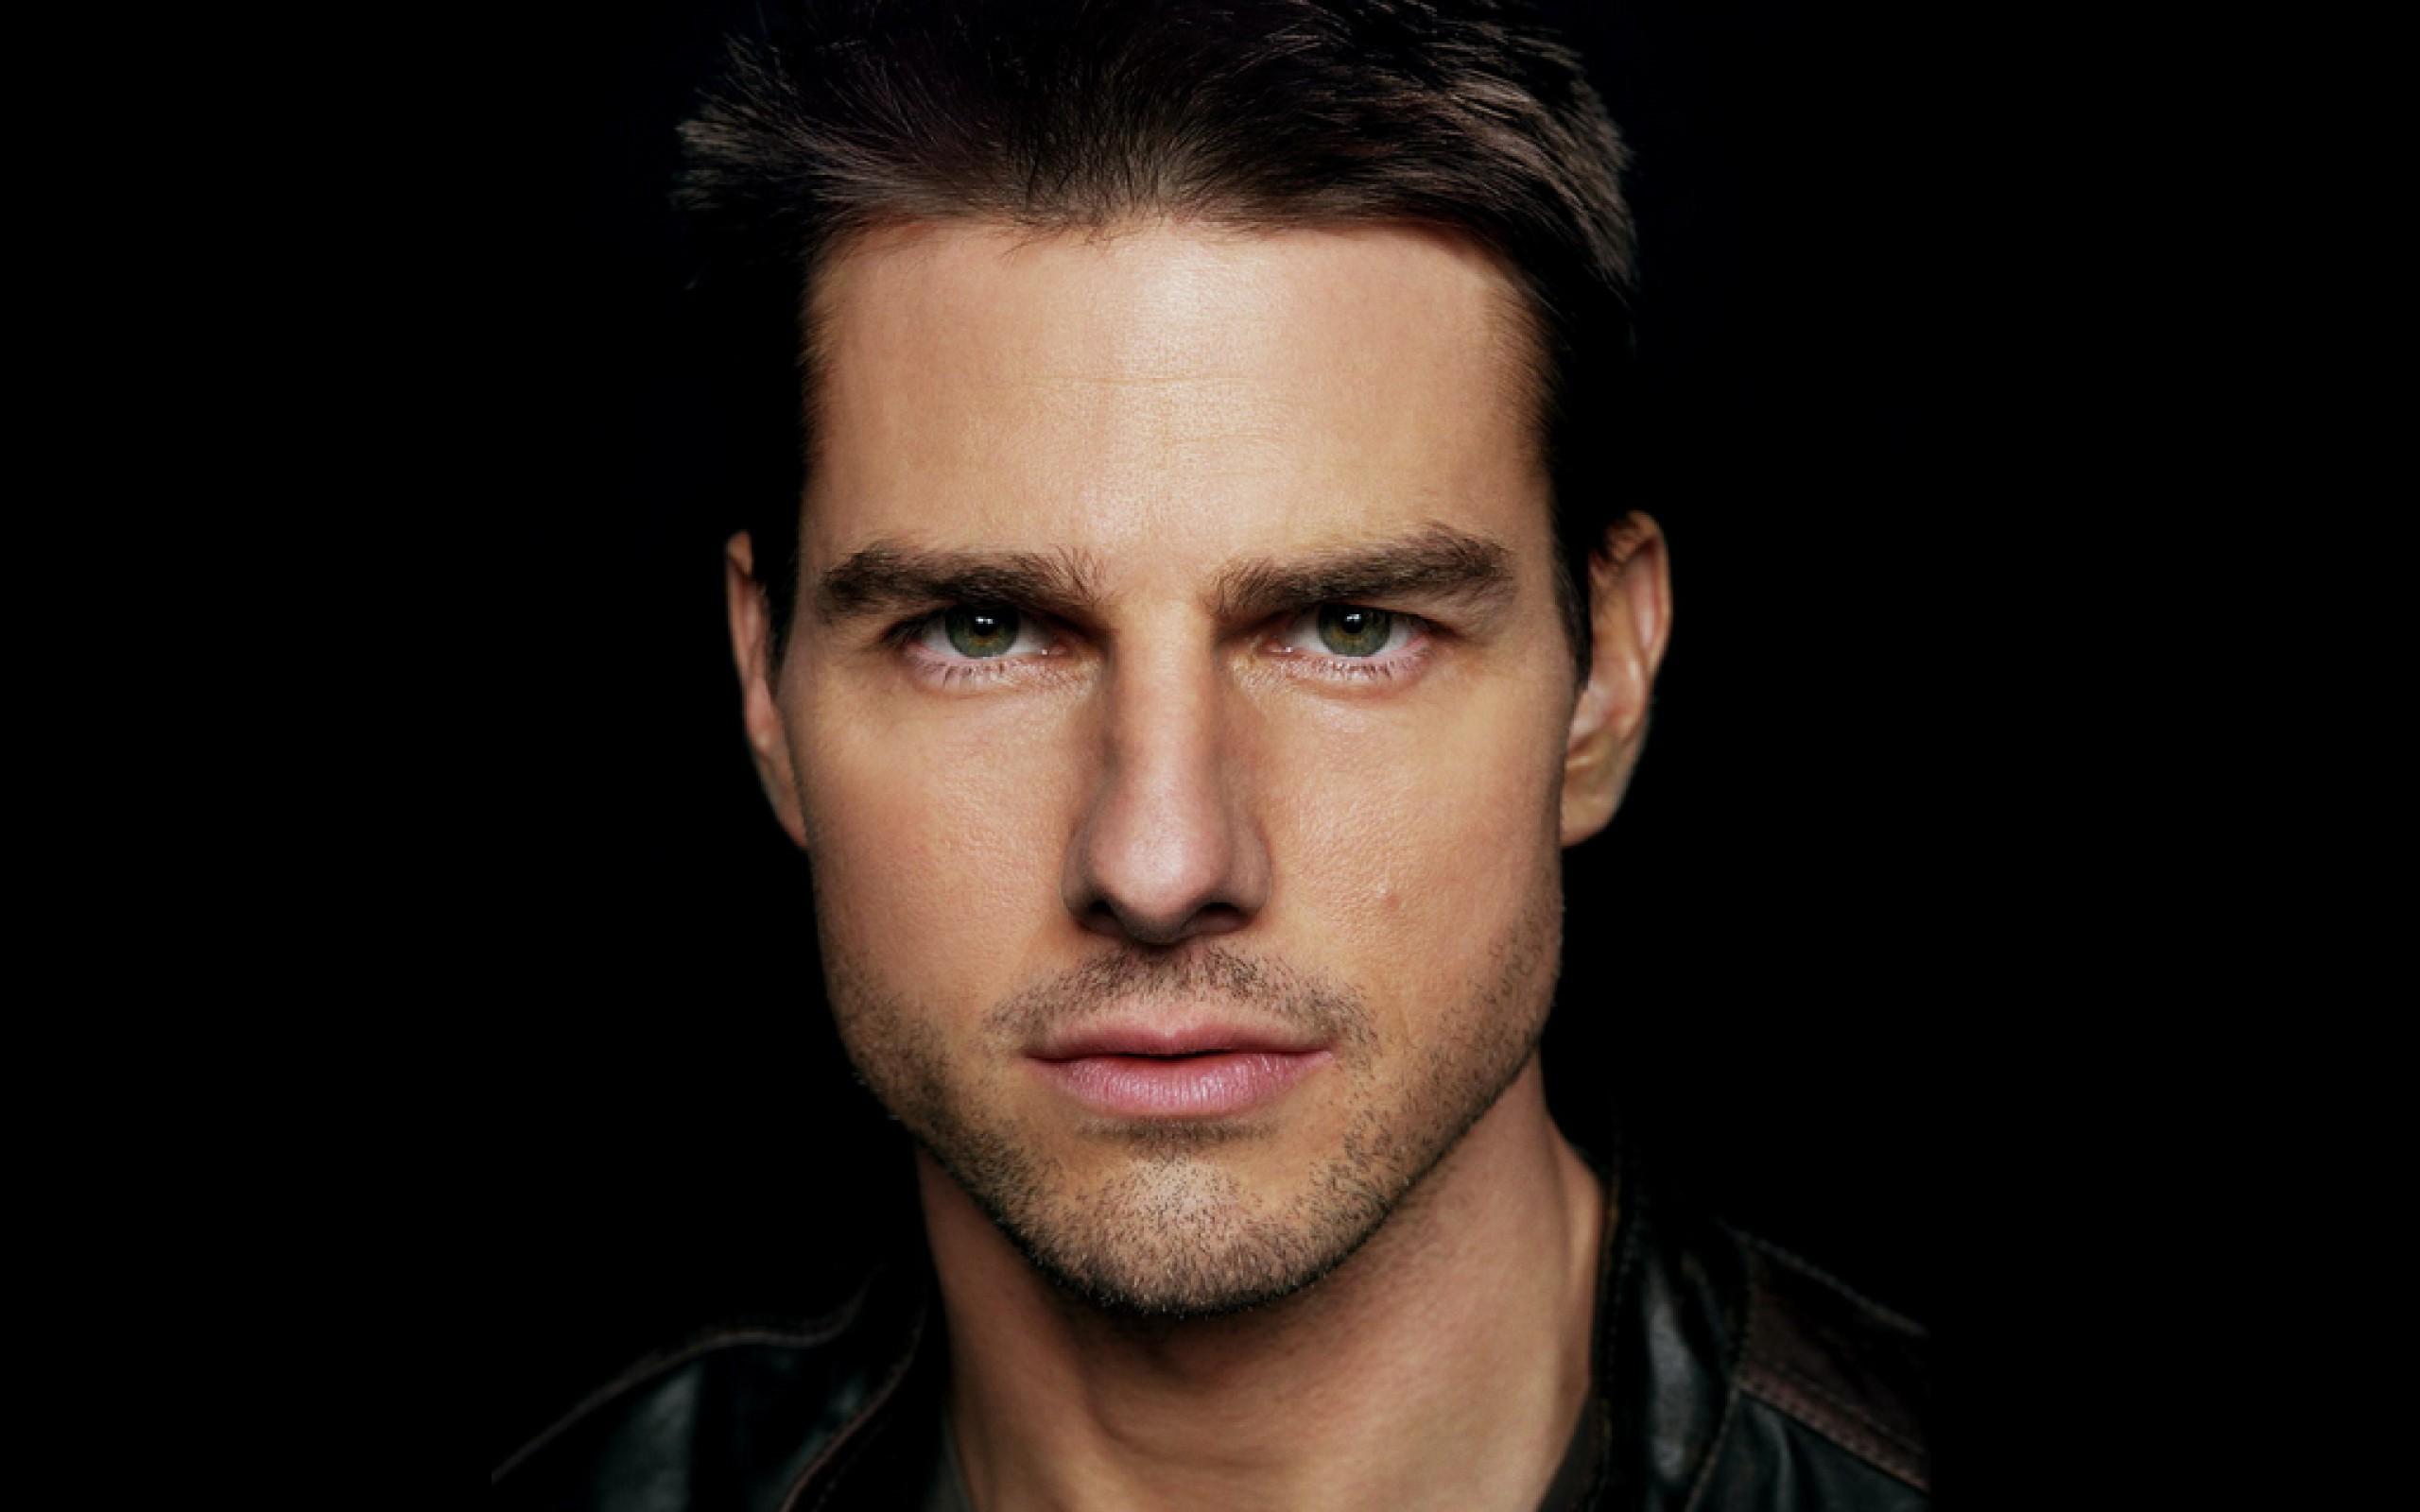 Tom Cruise Wallpaper 13